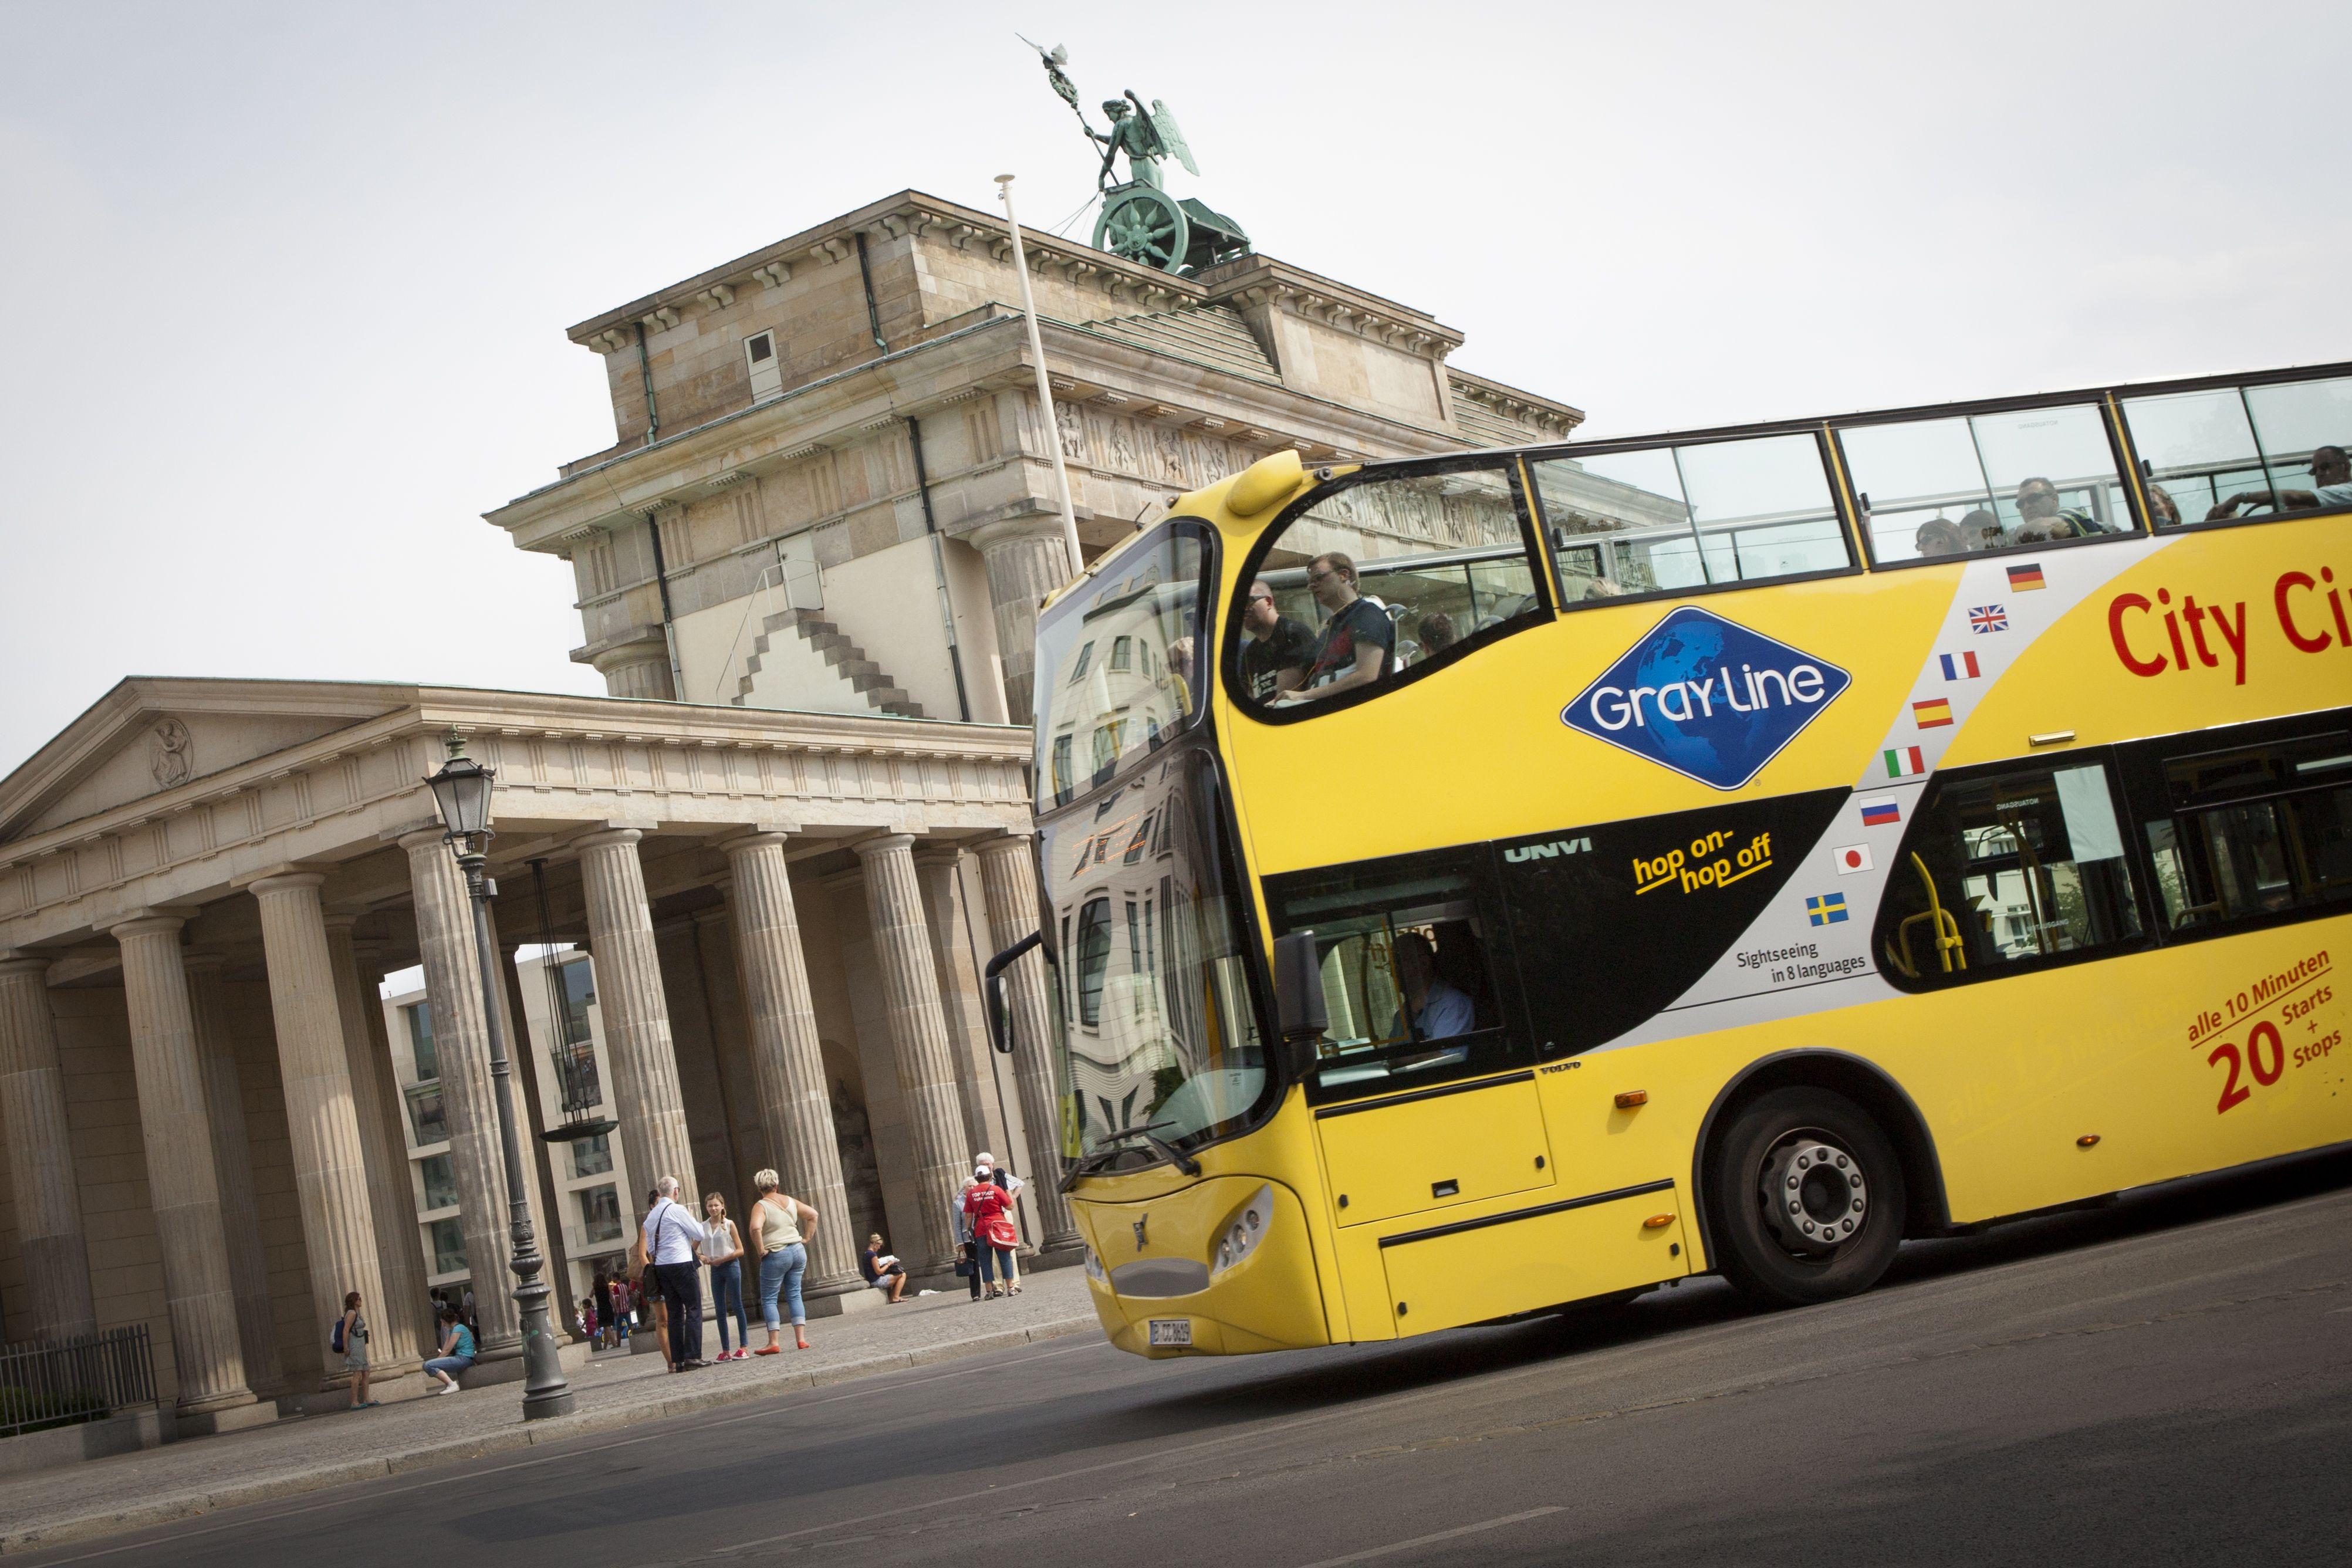 Until 1989 The Brandenburg Gate Brandenburger Tor Was A Symbol For The Division Of Berlin And Germany And Now Stands For Ger Brandenburger Tor Hauptstadt Bus